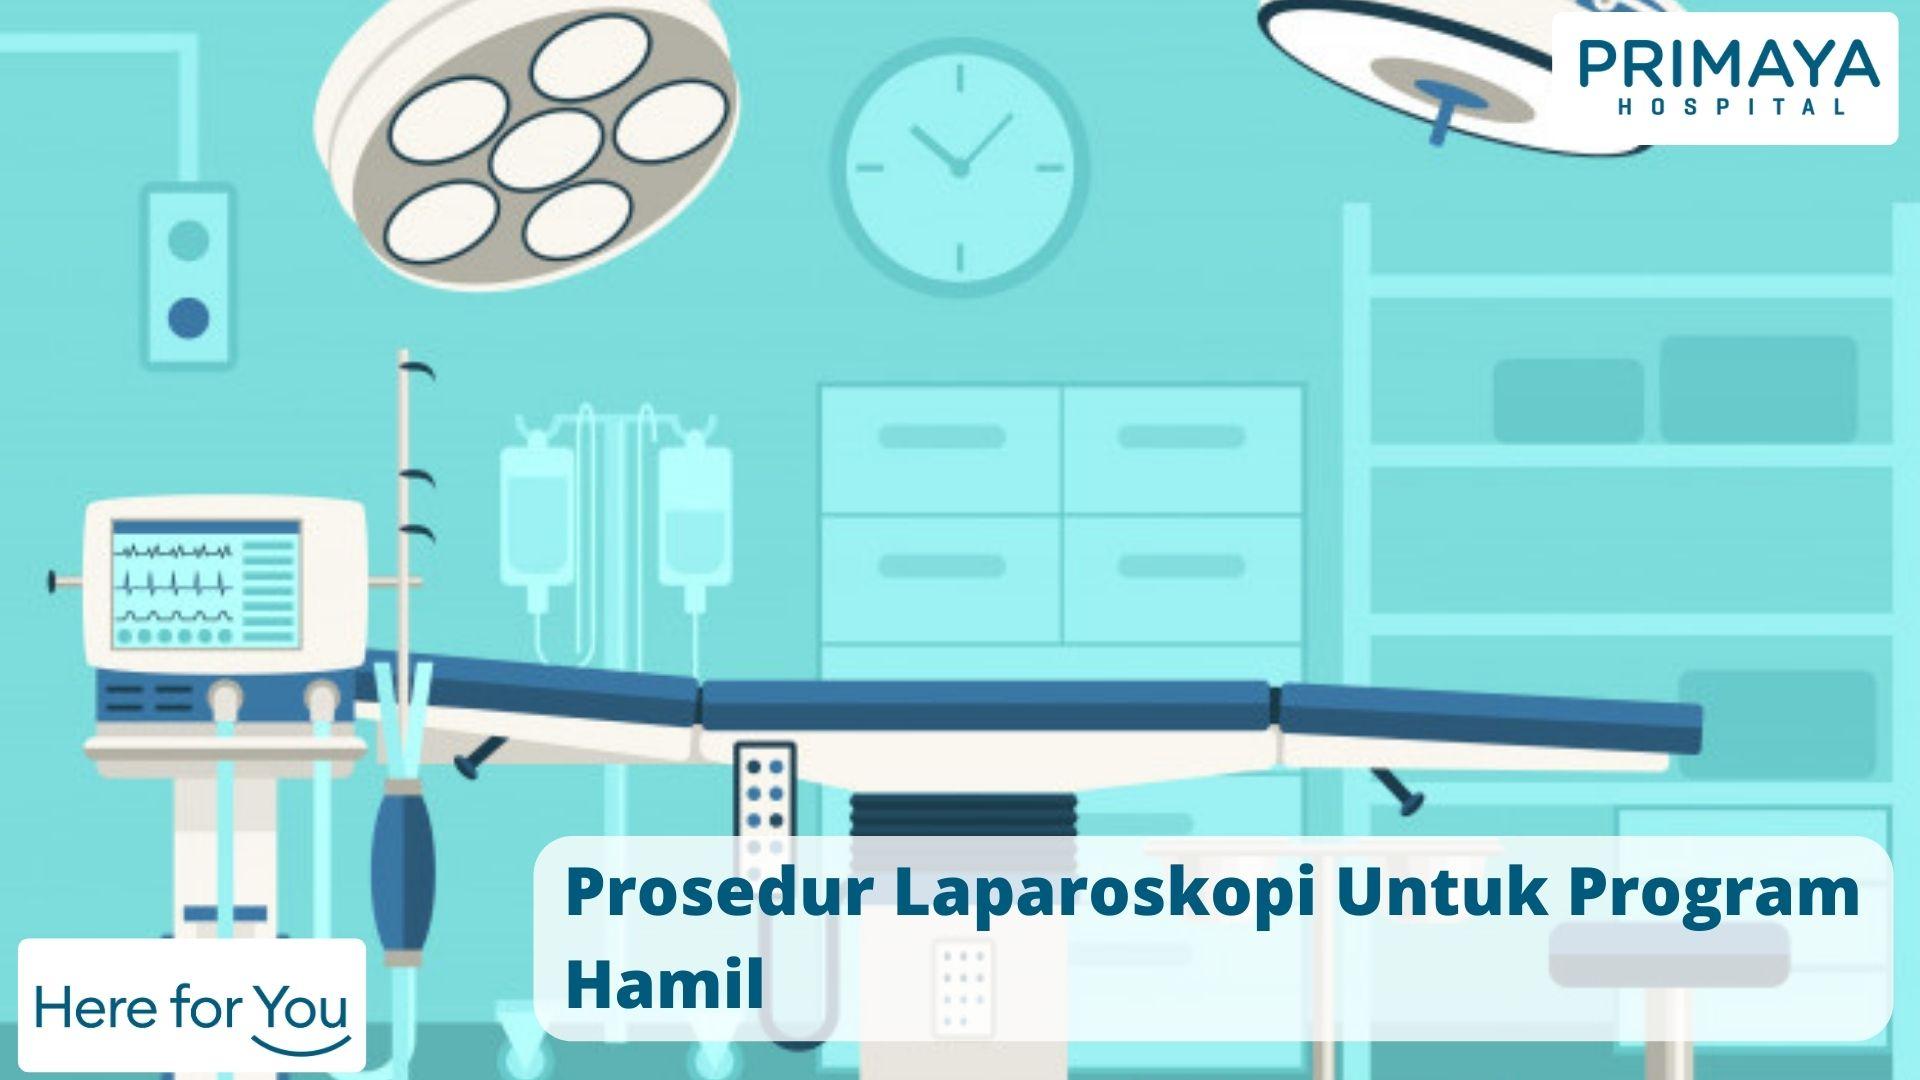 Prosedur Laparoskopi Untuk Program Hamil